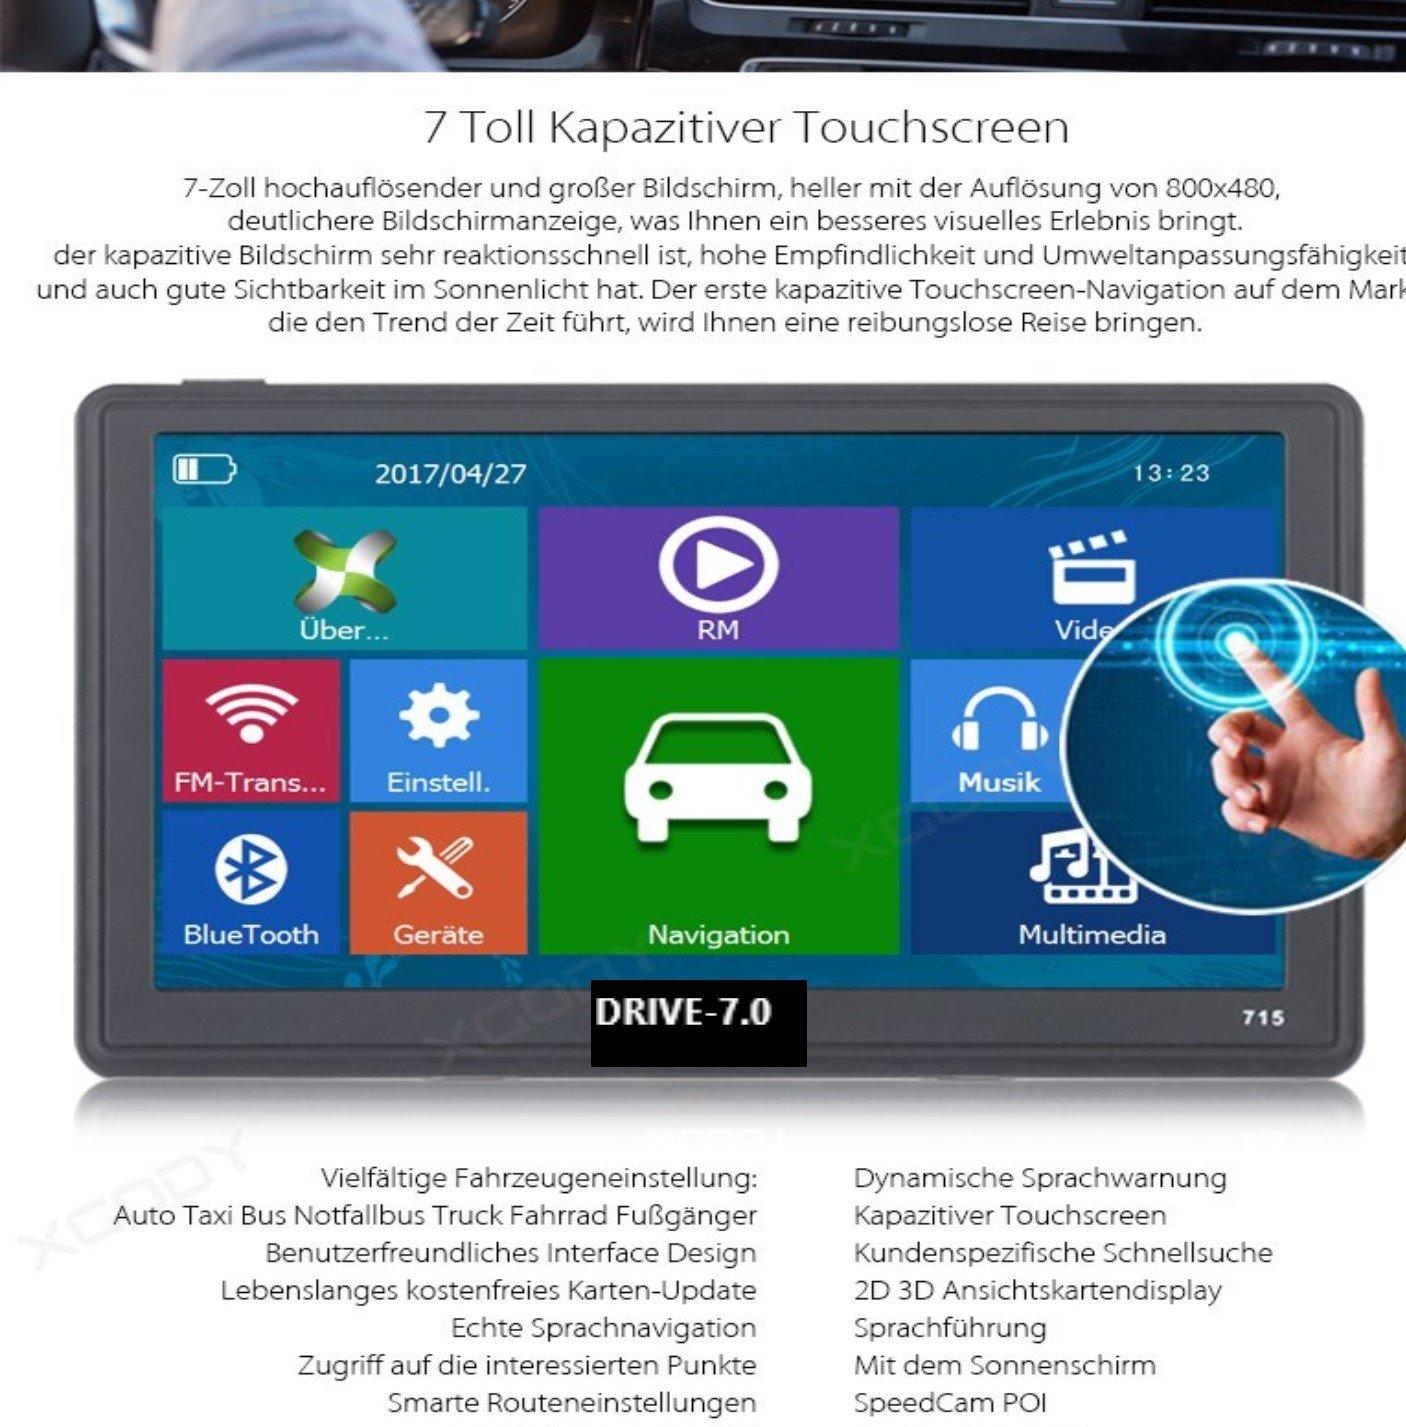 7-Zoll-GPS-Navigationssysteme-Navi-Drive-70-fr-LKWPKWWOHNMOBIL-Bus-256MB-Kapazitiver-Touchscreen-DEUTSCHE-HNDLER-Radarwarner-Kostenlos-Update-8GB-Gratis-Sonnenblende